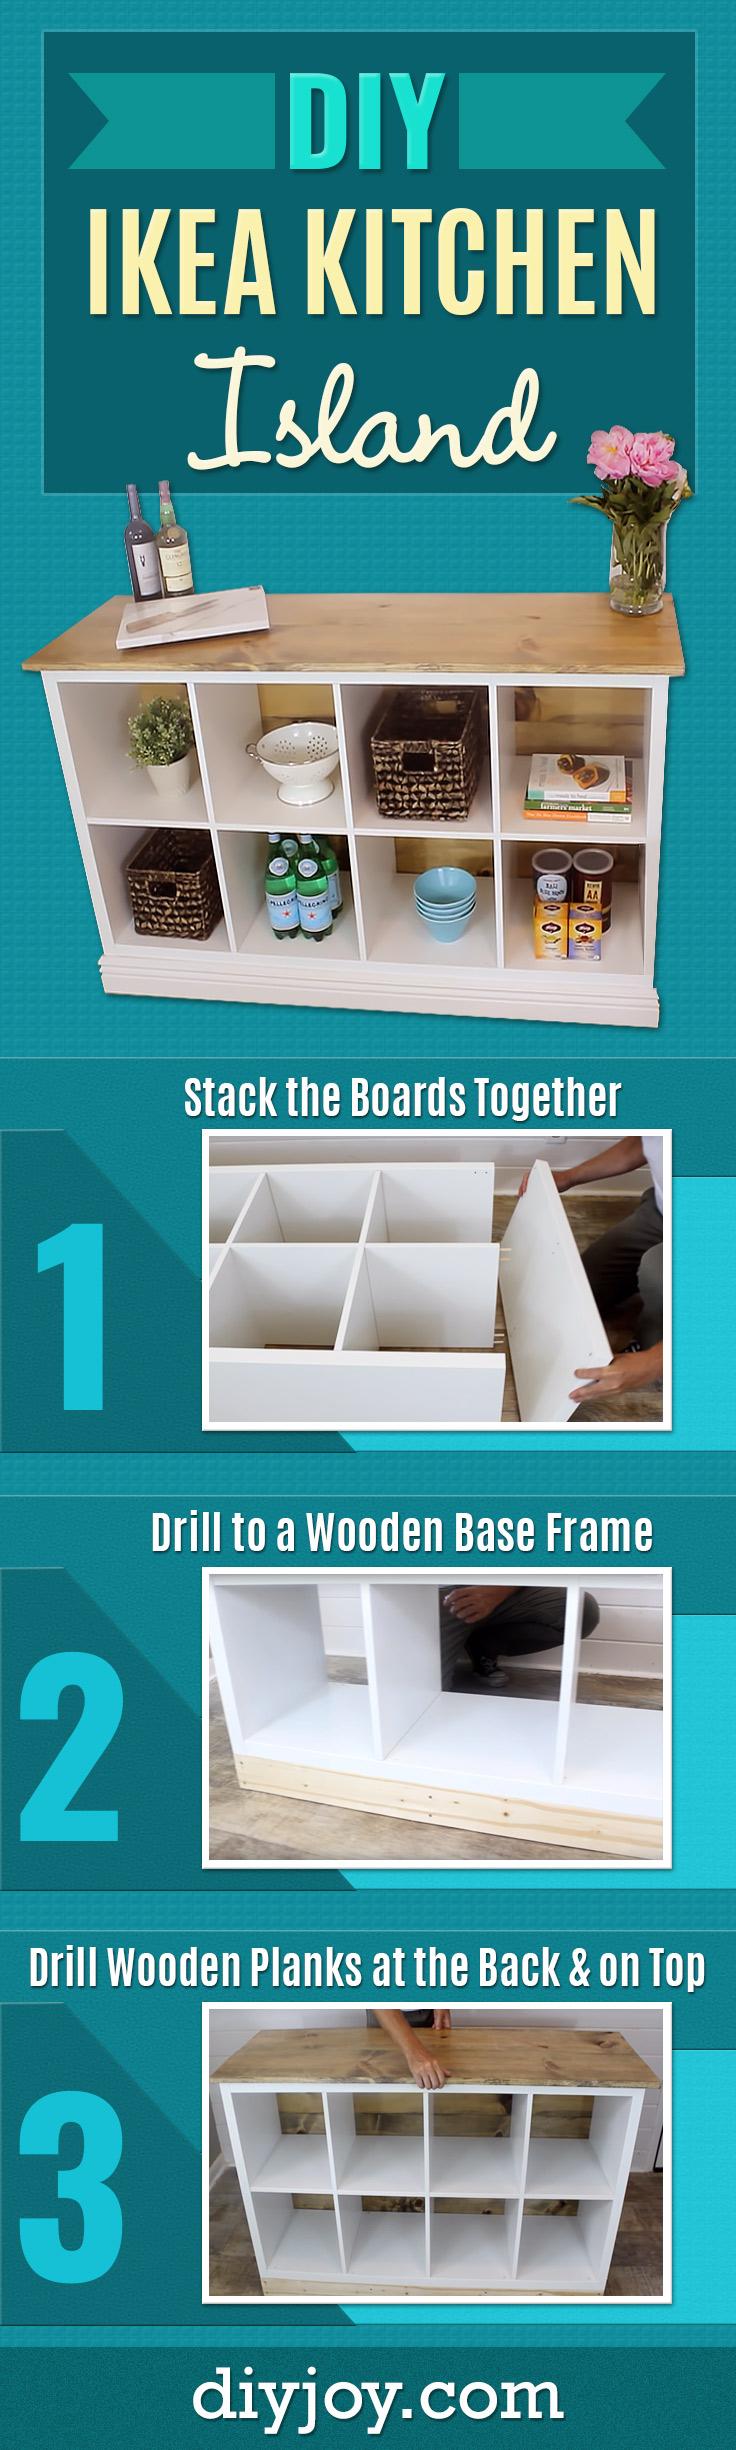 DIY Kitchen Island - IKEA Hacks for Kitchens - Cheap Home Decor Idea - Inexpensive Furniture Ideas To Make